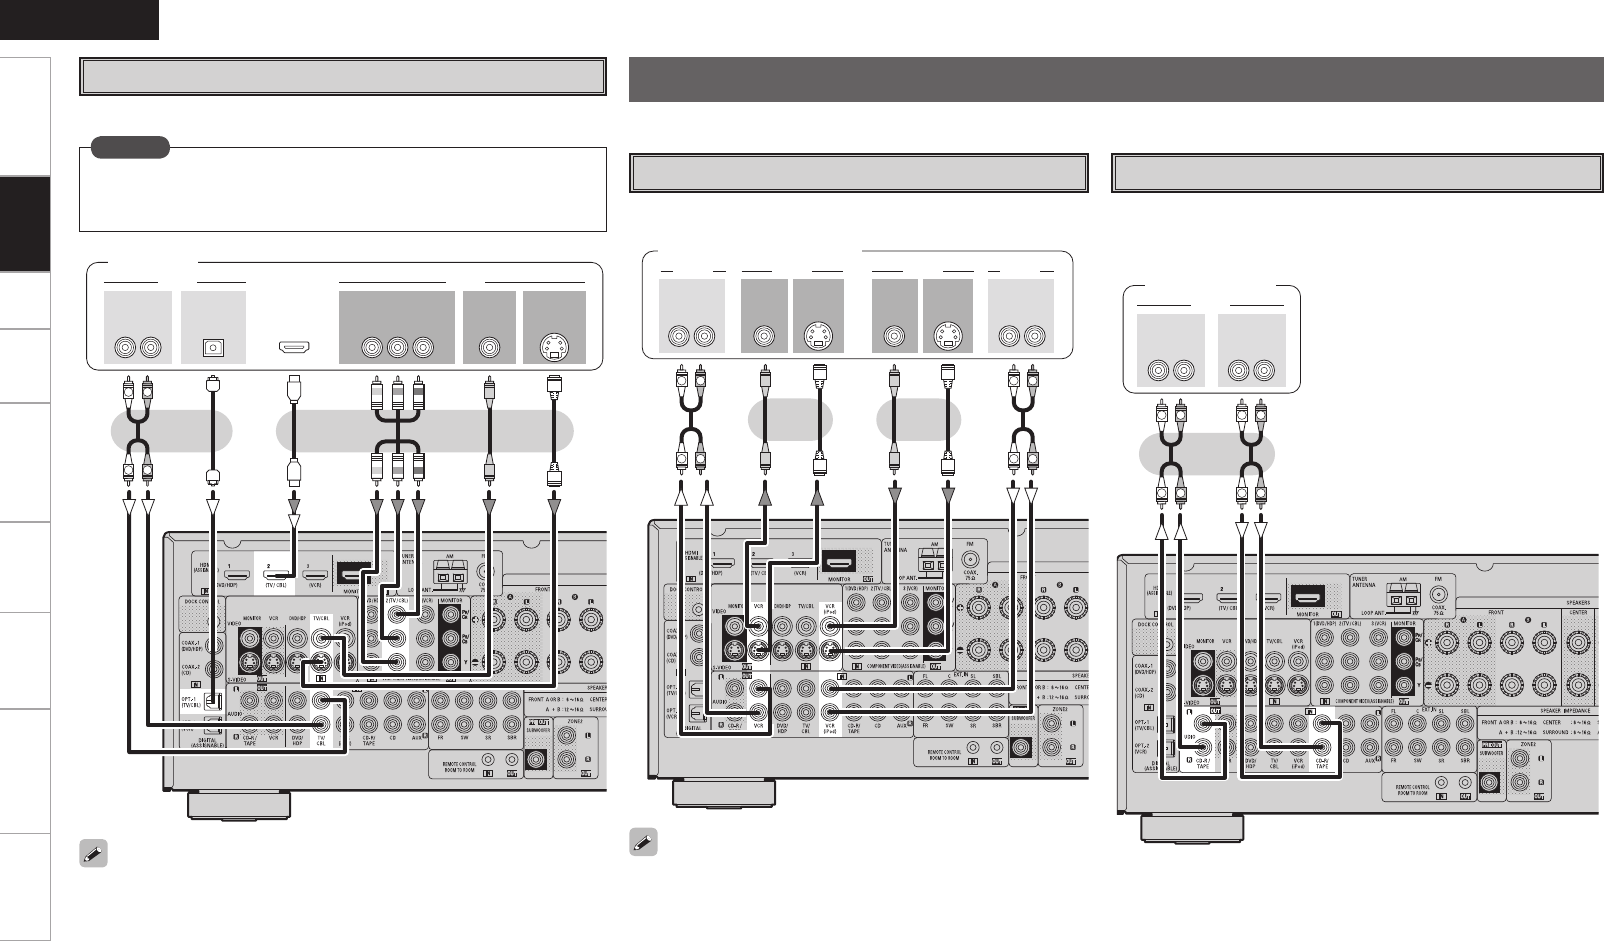 Handleiding Denon Avr 1709 Pagina 14 Van 65 English Td Cortina Wiring Diagram